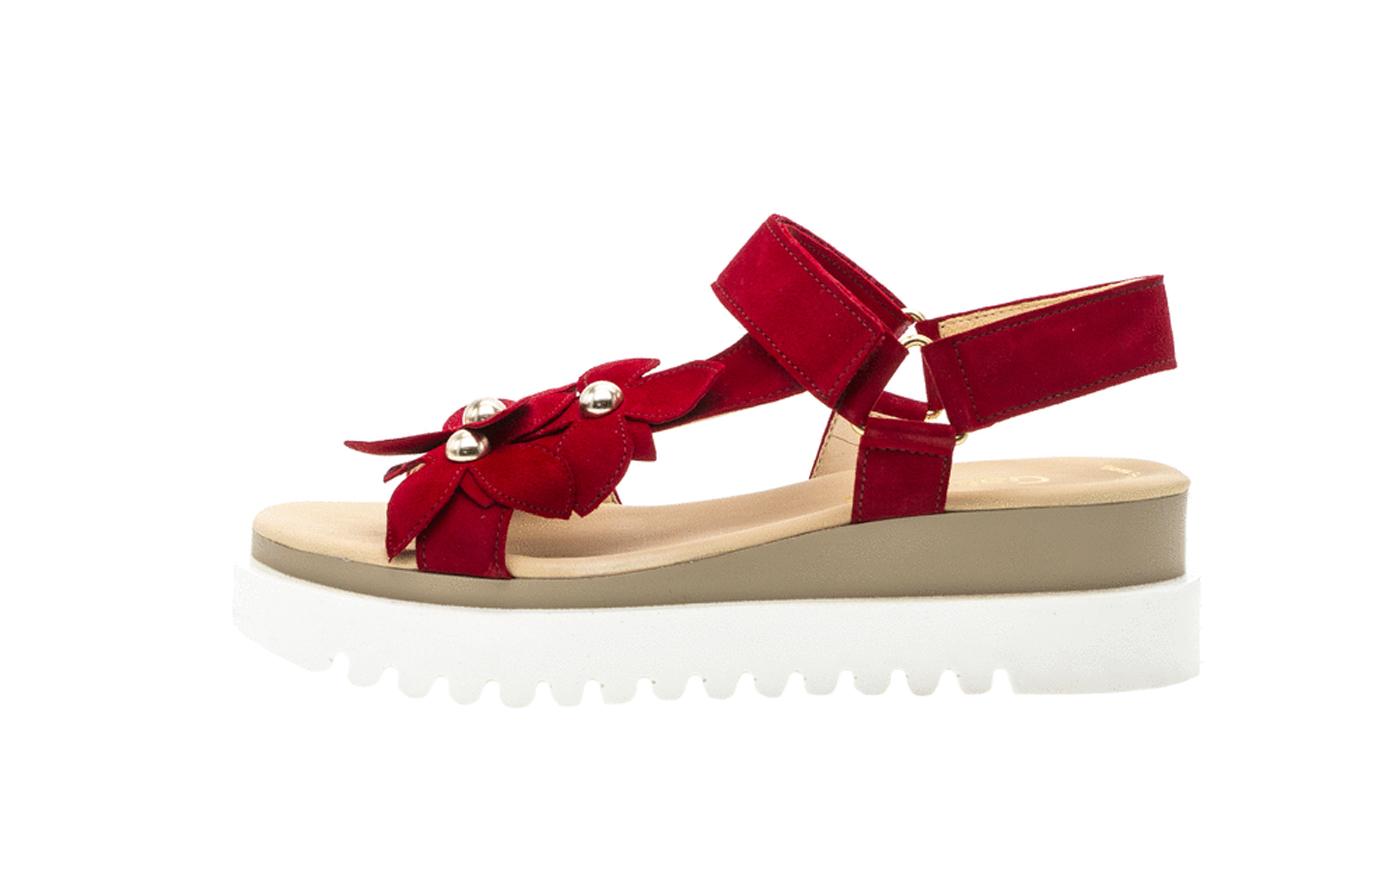 sports shoes 9064e 893e6 Gabor Damen Sandalette 23.611.15 rubin rot